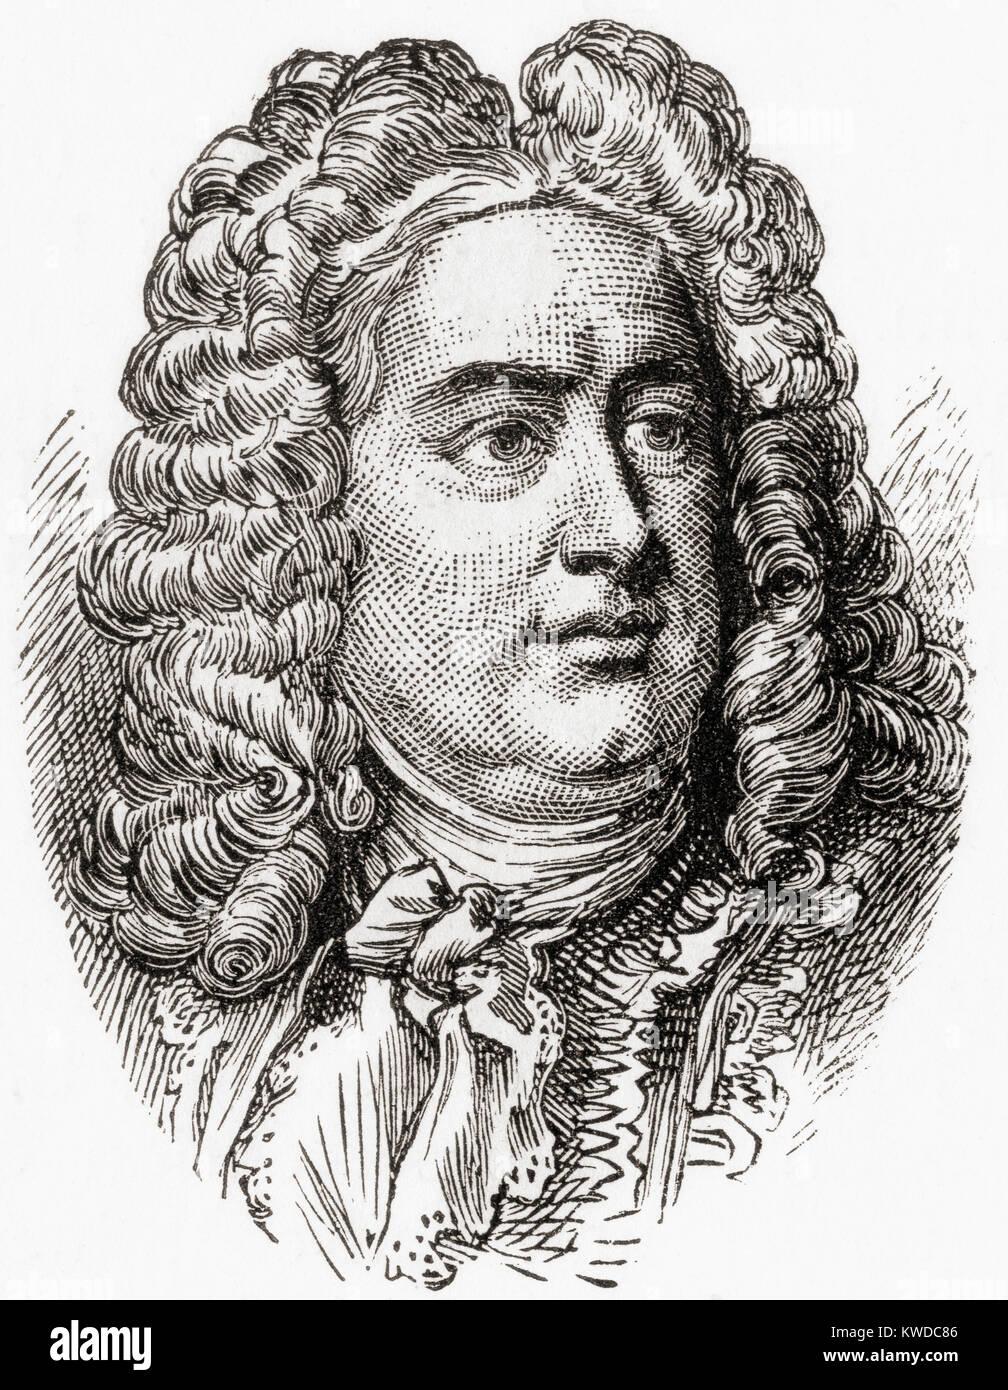 TODAY IN BIRTHDAYS: LUIGI BOCCHERINI - February 19, 1743 ...